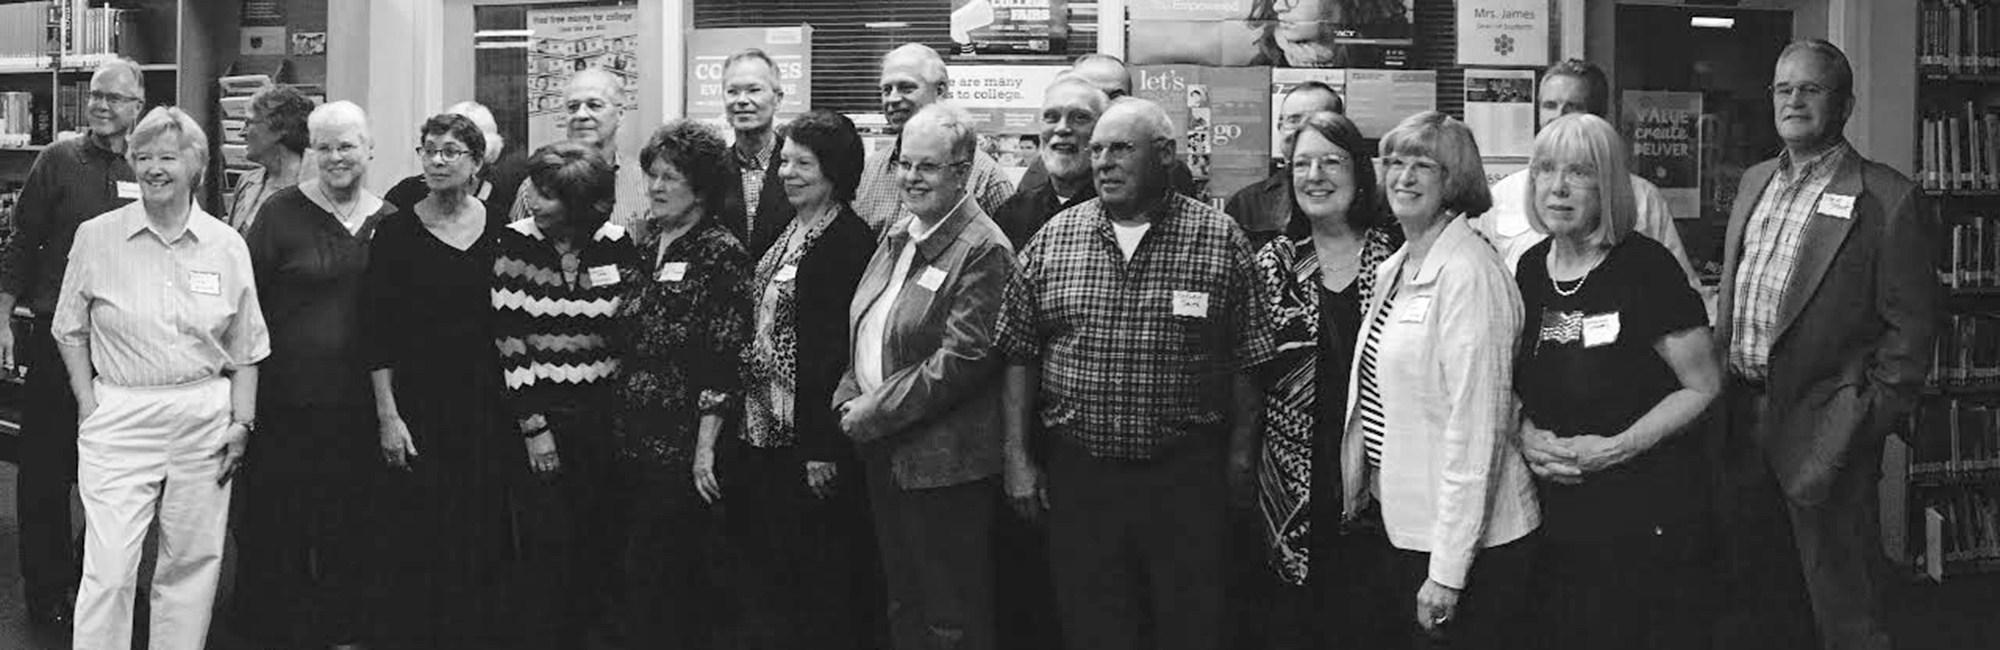 Class of 1966 alumni reunion